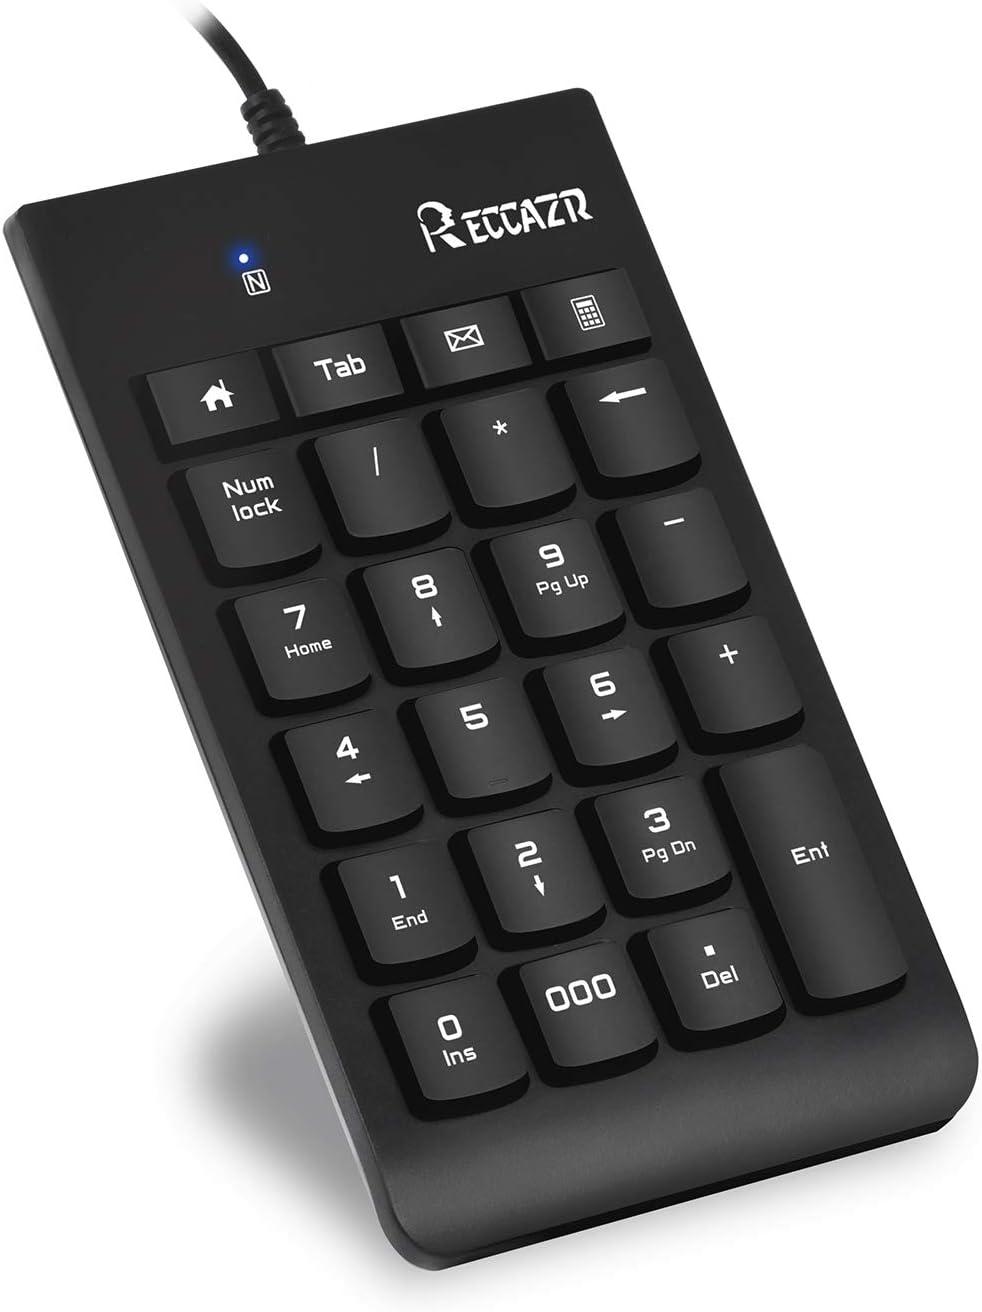 Numeric keypad, 23-Key USB Number Pad Portable, Financial Accounting Numeric Keypad, Numpad with Multi-Function Shortcut Keys for Laptop, Desktop, PC Computer - RECCAZR FN10 (Black+Normal keycaps)